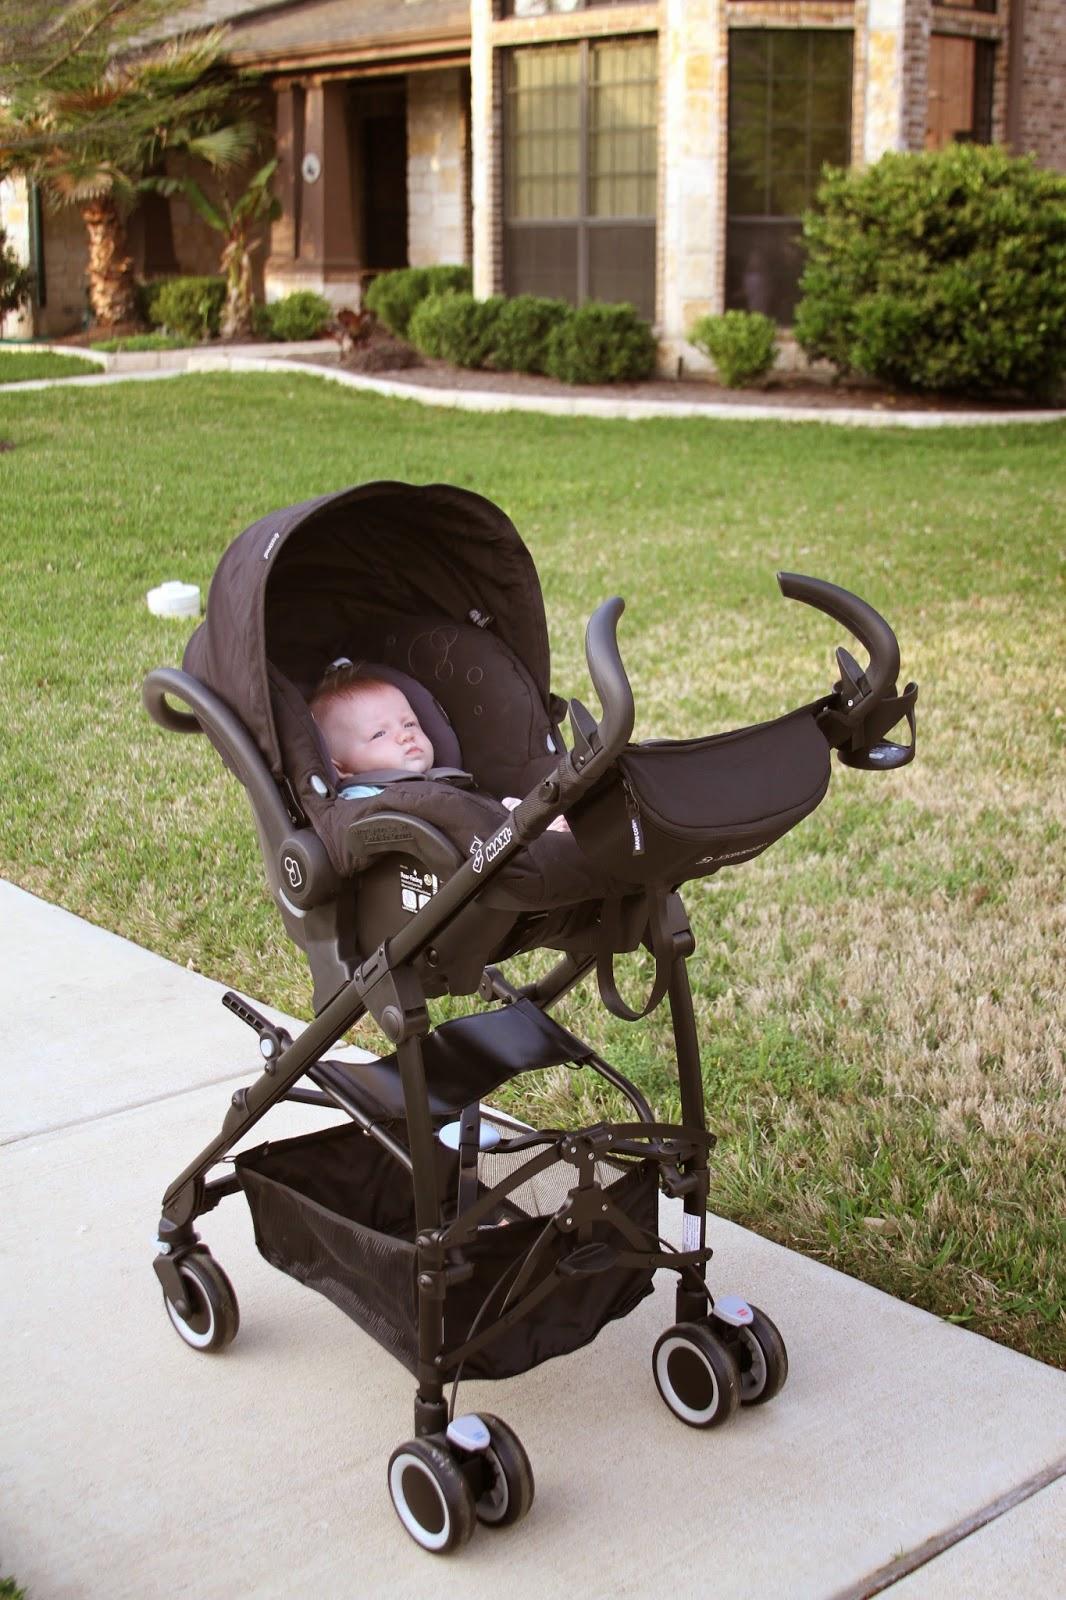 Maxi-Cosi Mico NXT Infant Car Seat   Maxi-Taxi Infant Car Seat ...